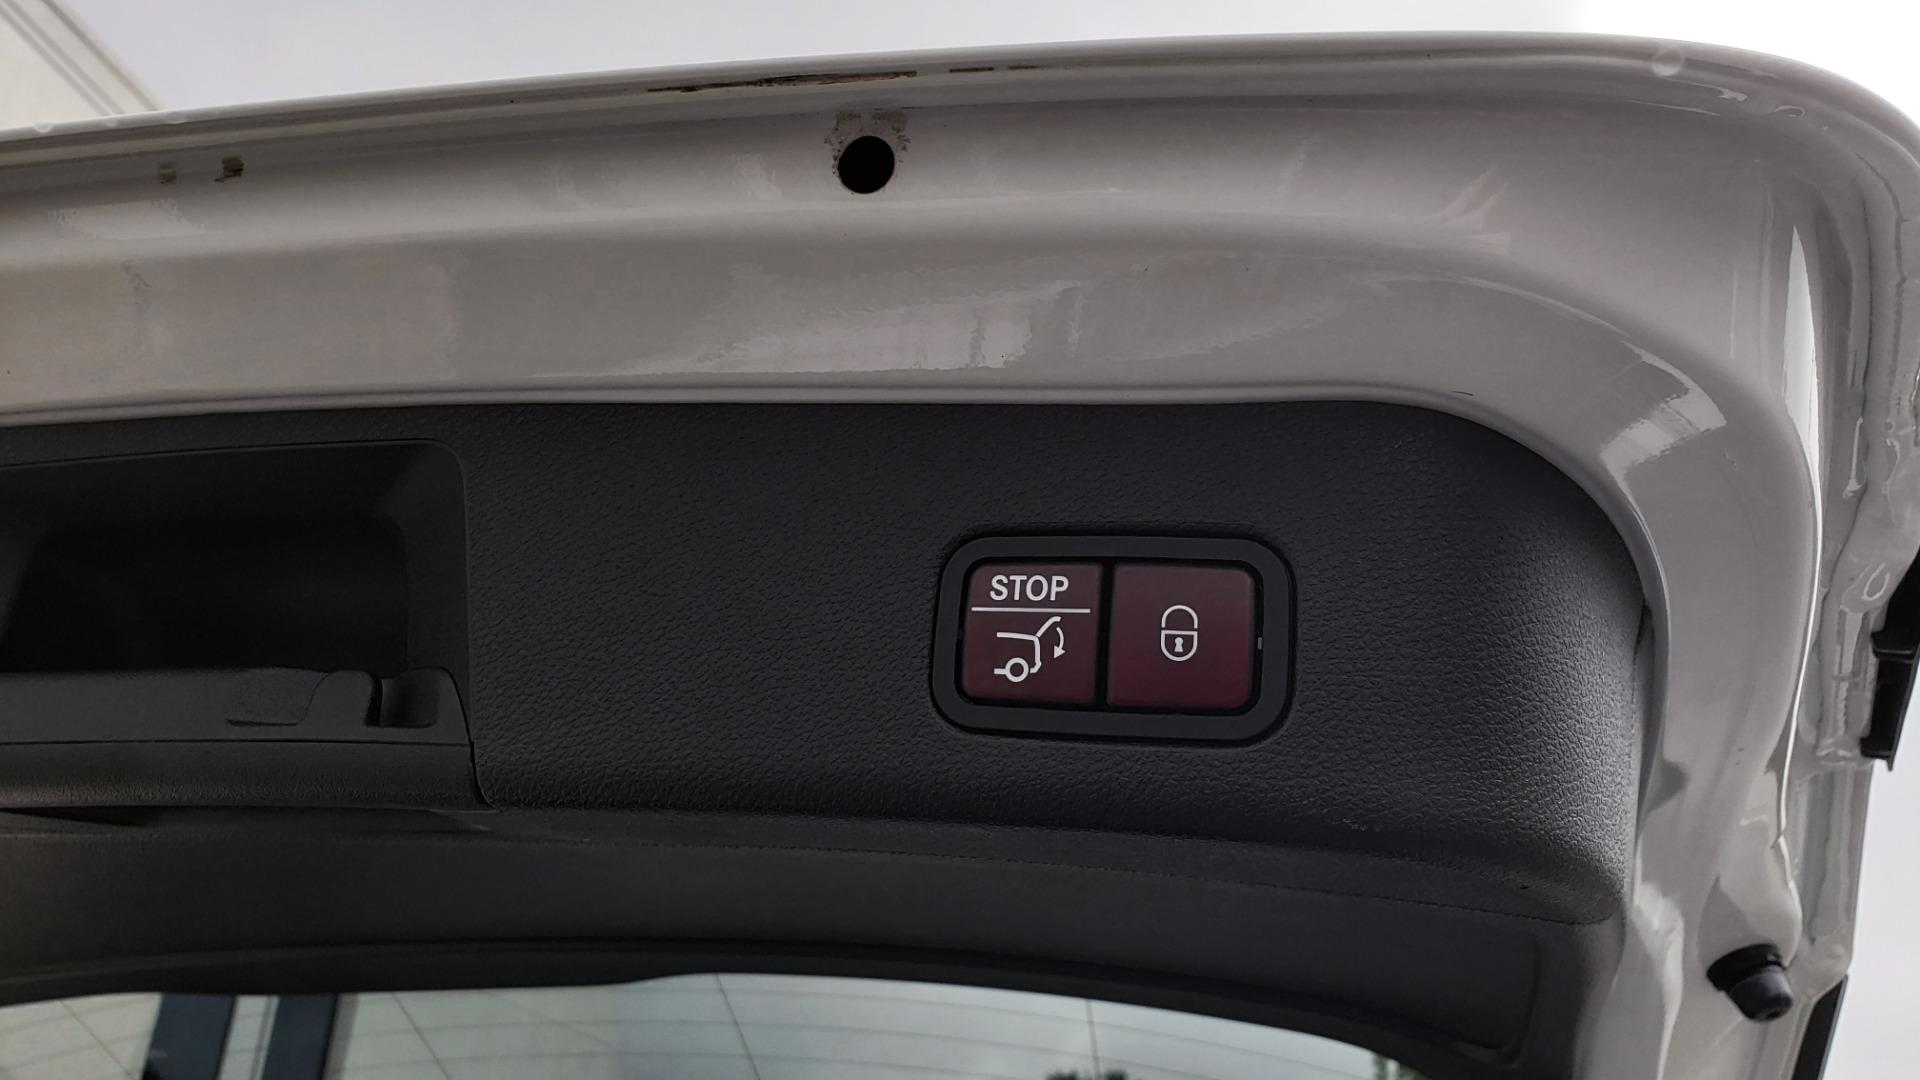 Used 2018 Mercedes-Benz GLE 350 4MATIC / PREM PKG / NAV / PARK ASST / K/H SND / HITCH / REARVIEW for sale $40,801 at Formula Imports in Charlotte NC 28227 22